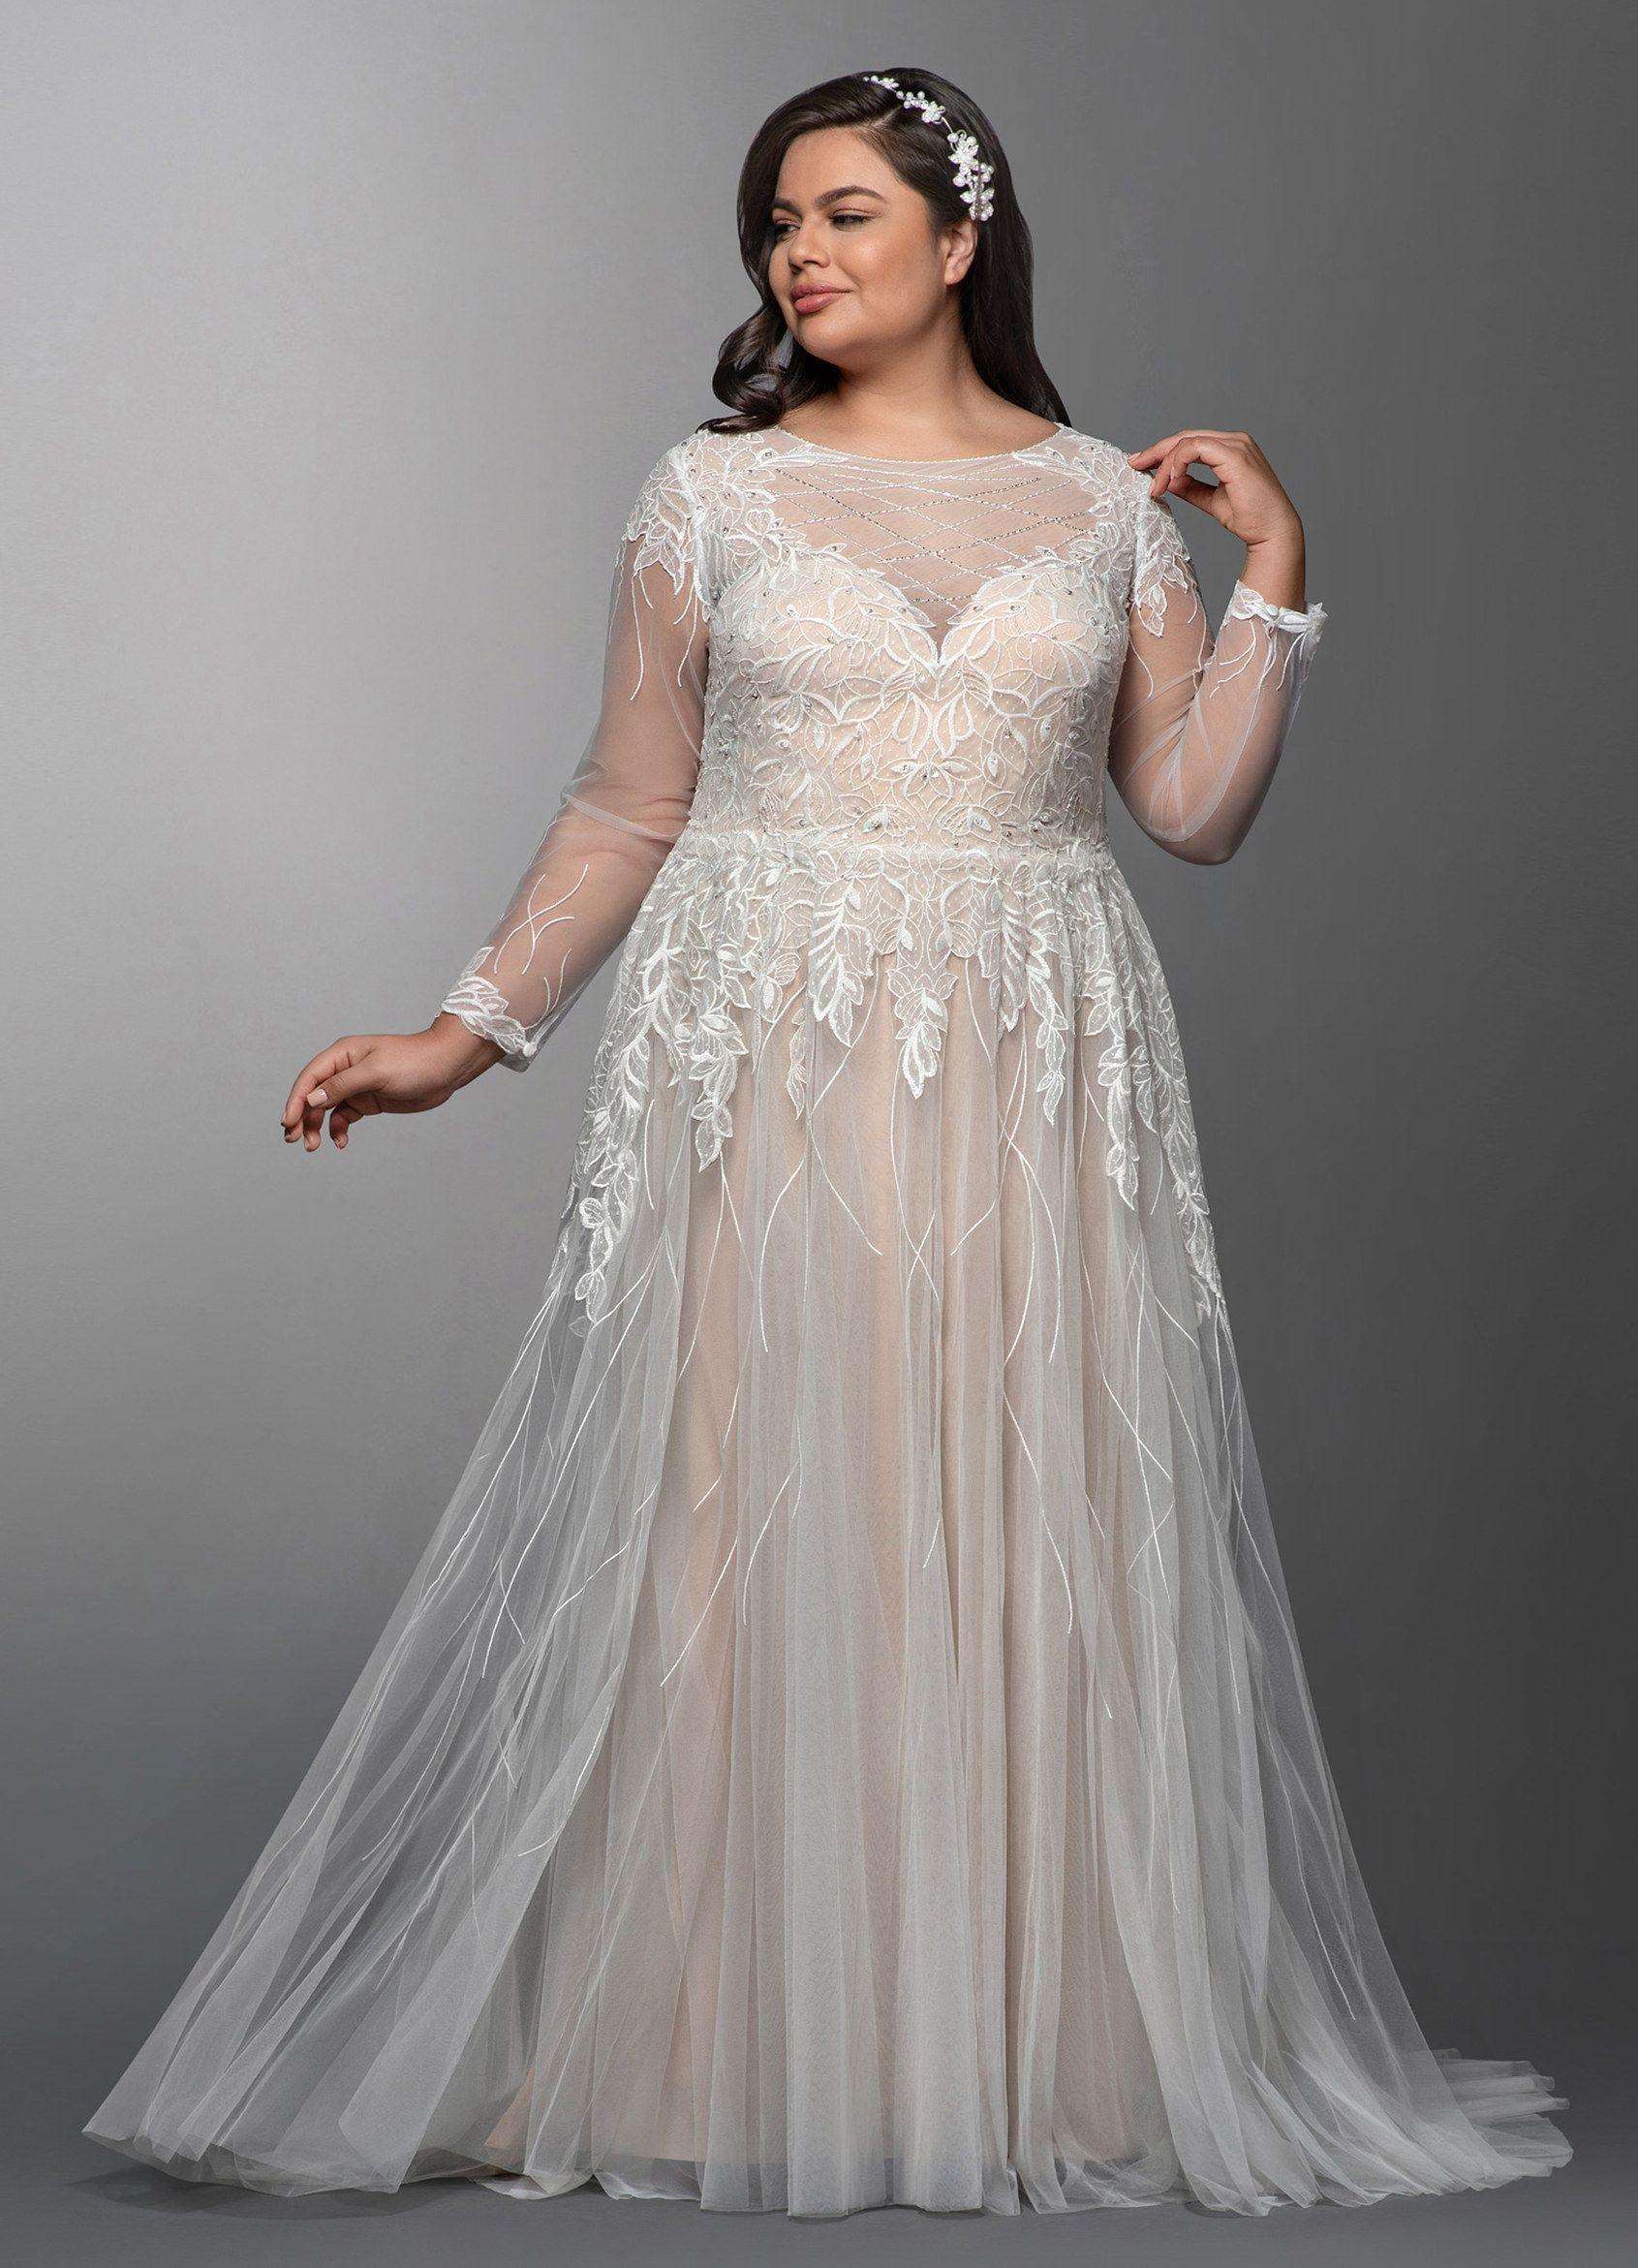 ELVINA BG Wedding Dress Wedding dresses near me